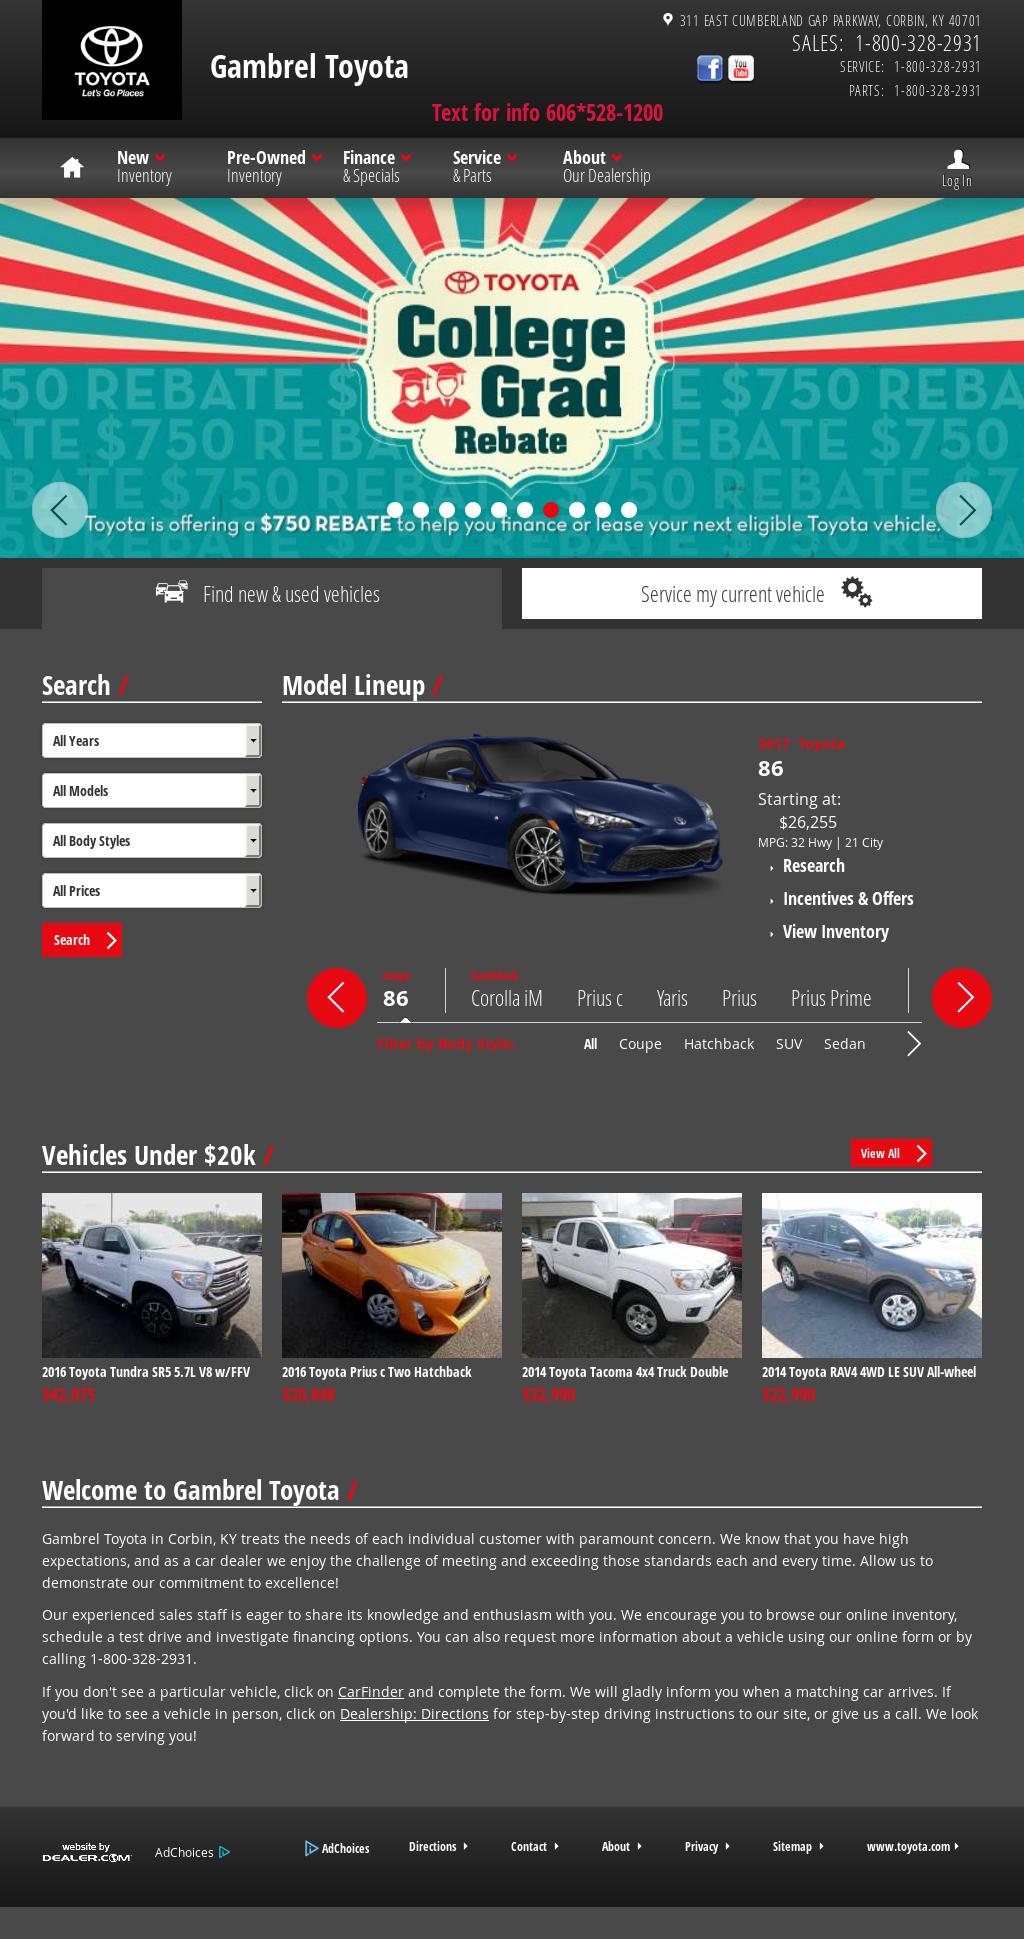 Gambrel Toyotau0027s Website Screenshot On Sep 2017